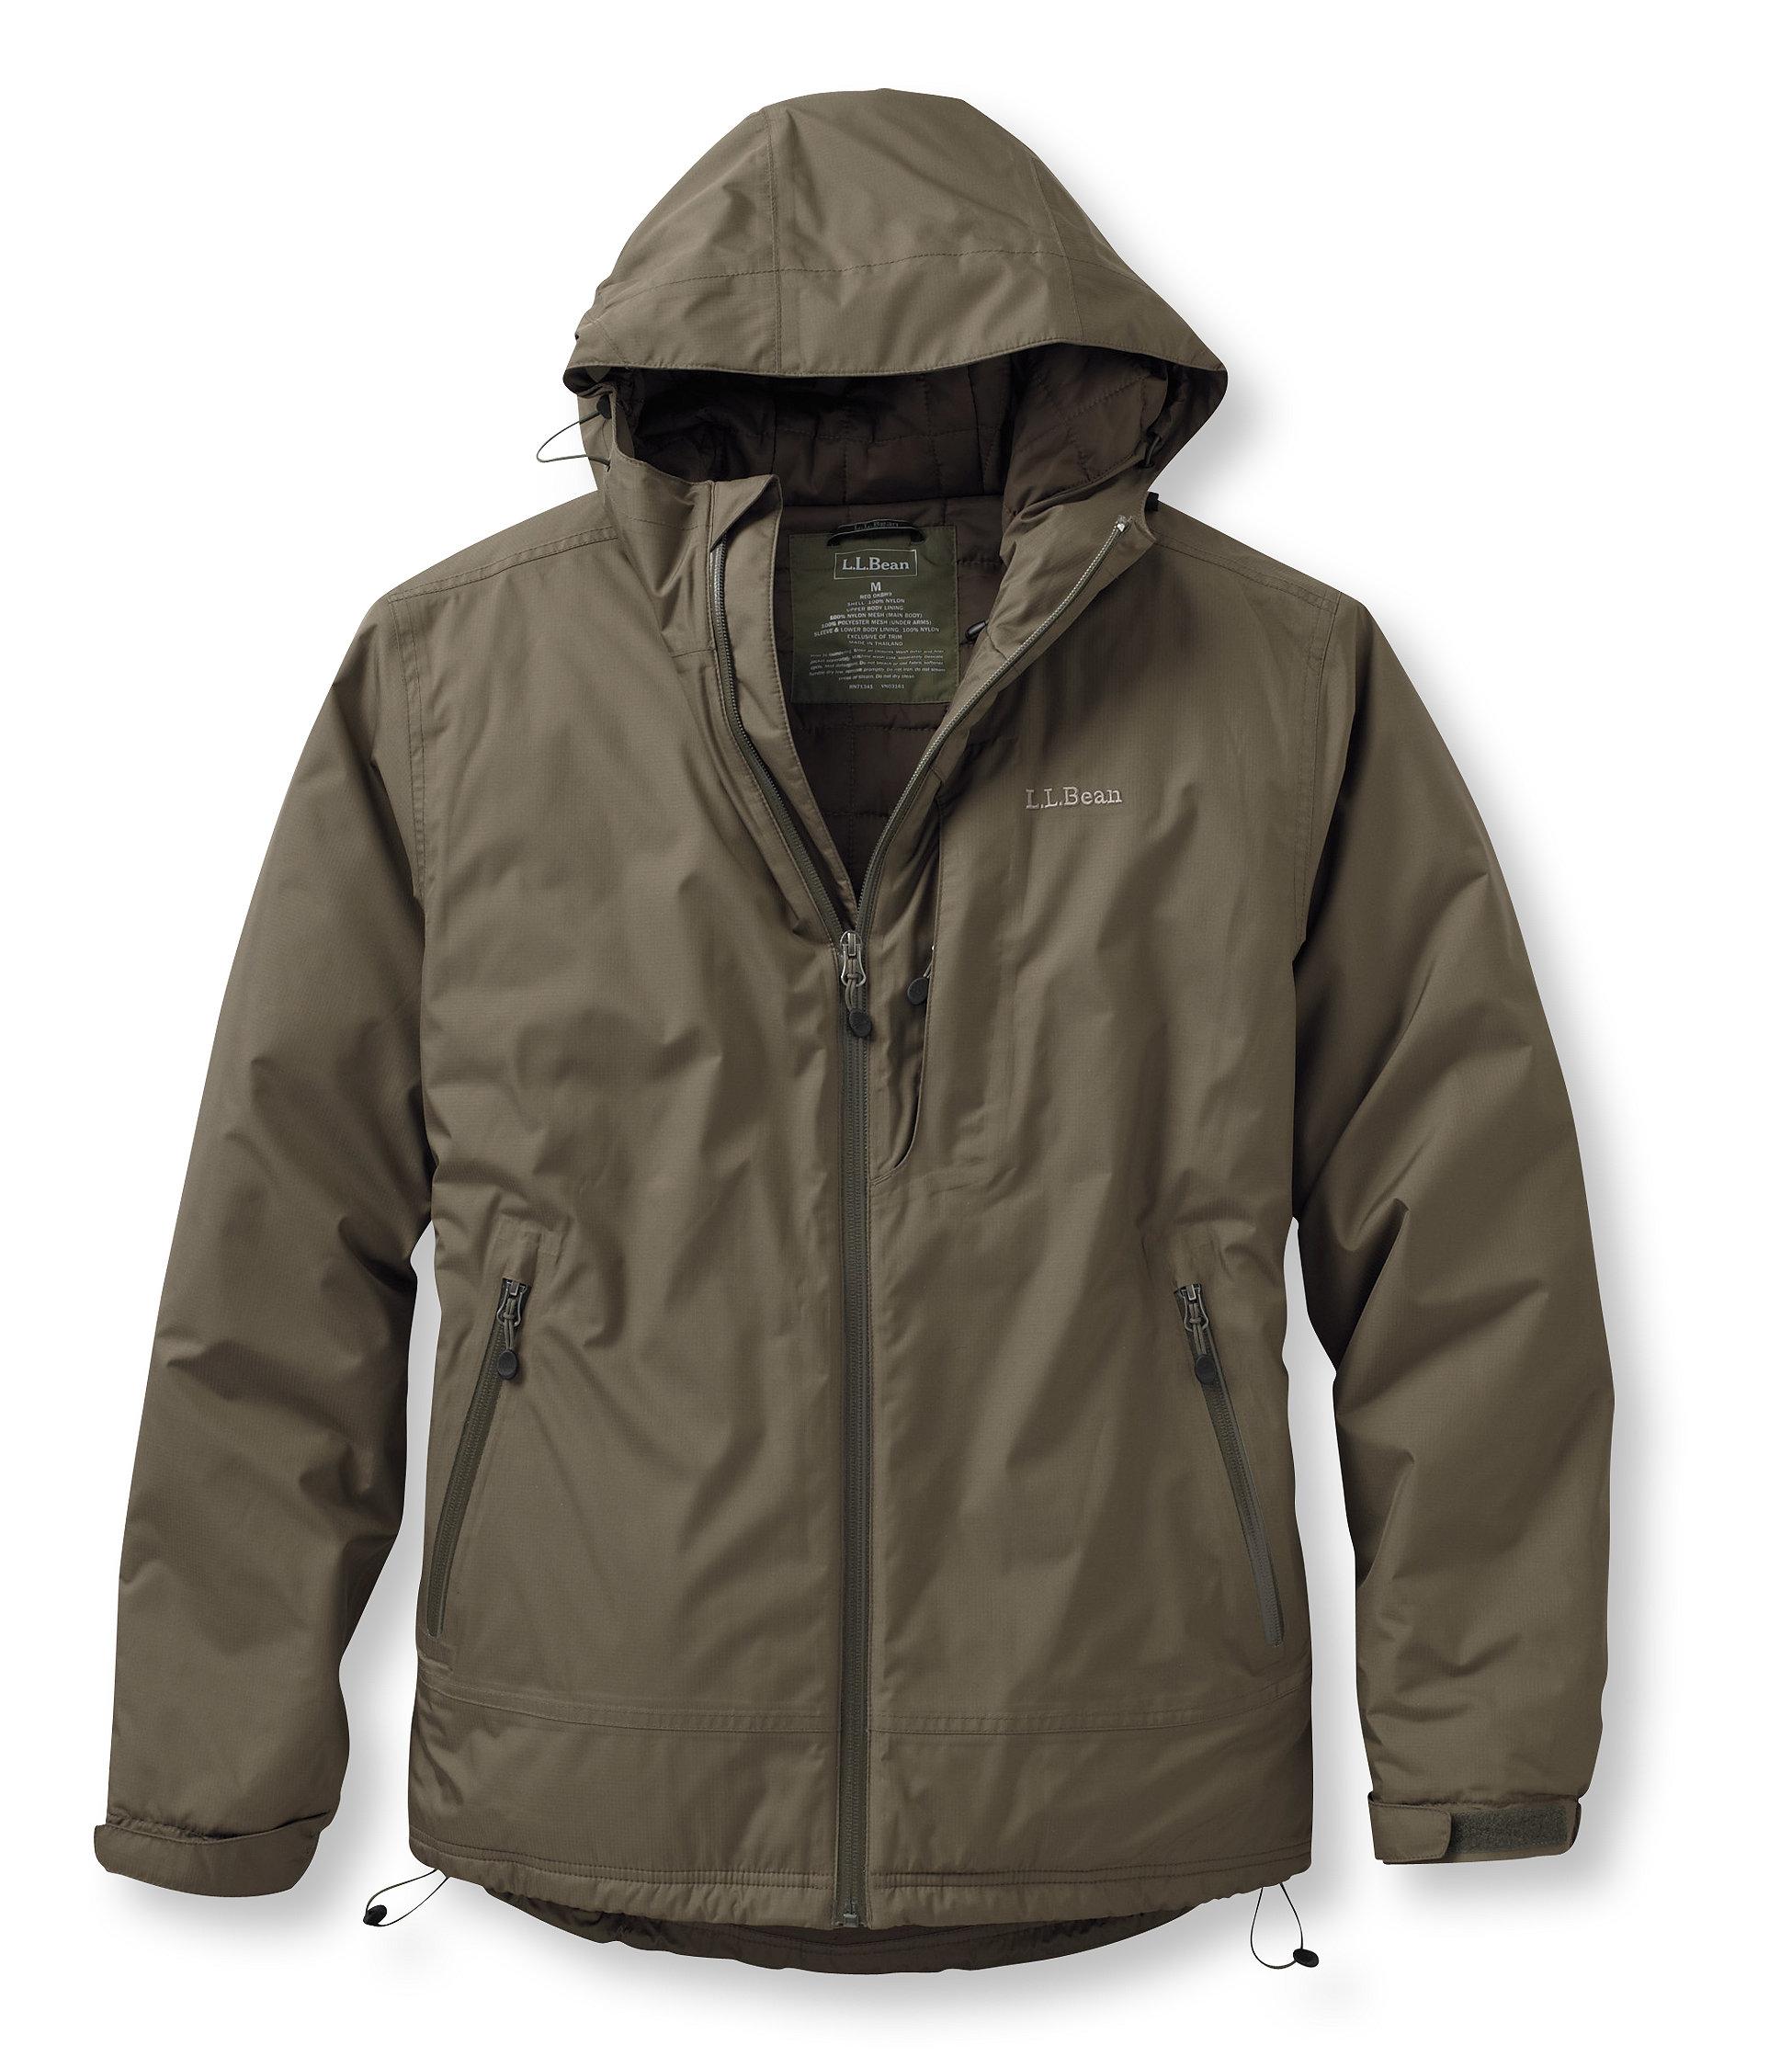 L.L.Bean Insulated Rain Jacket